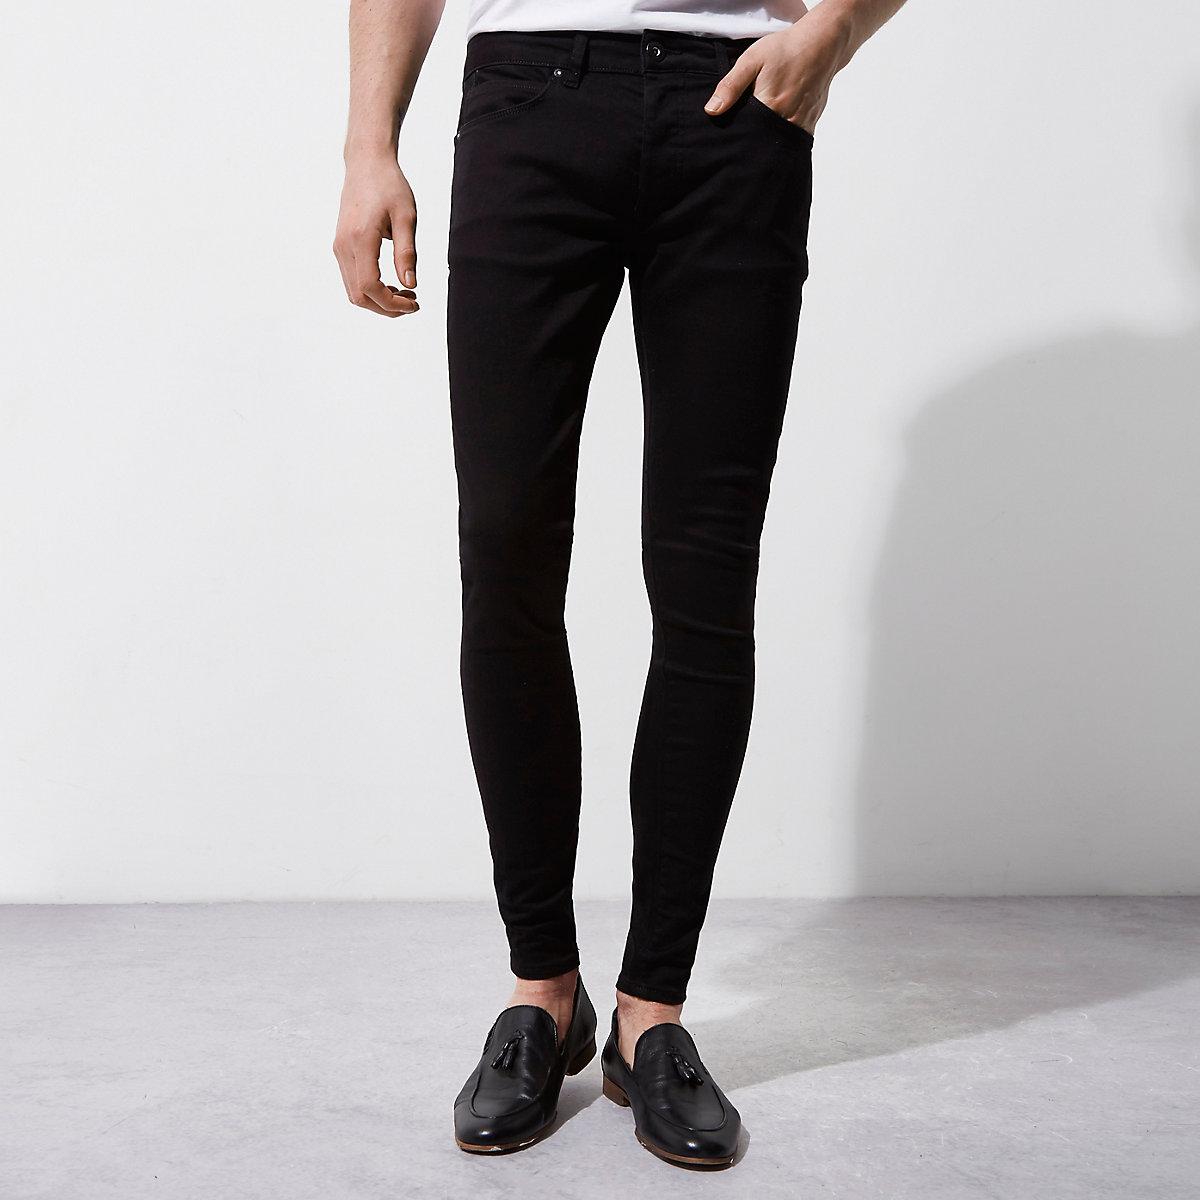 Black Ollie super skinny spray on jeans